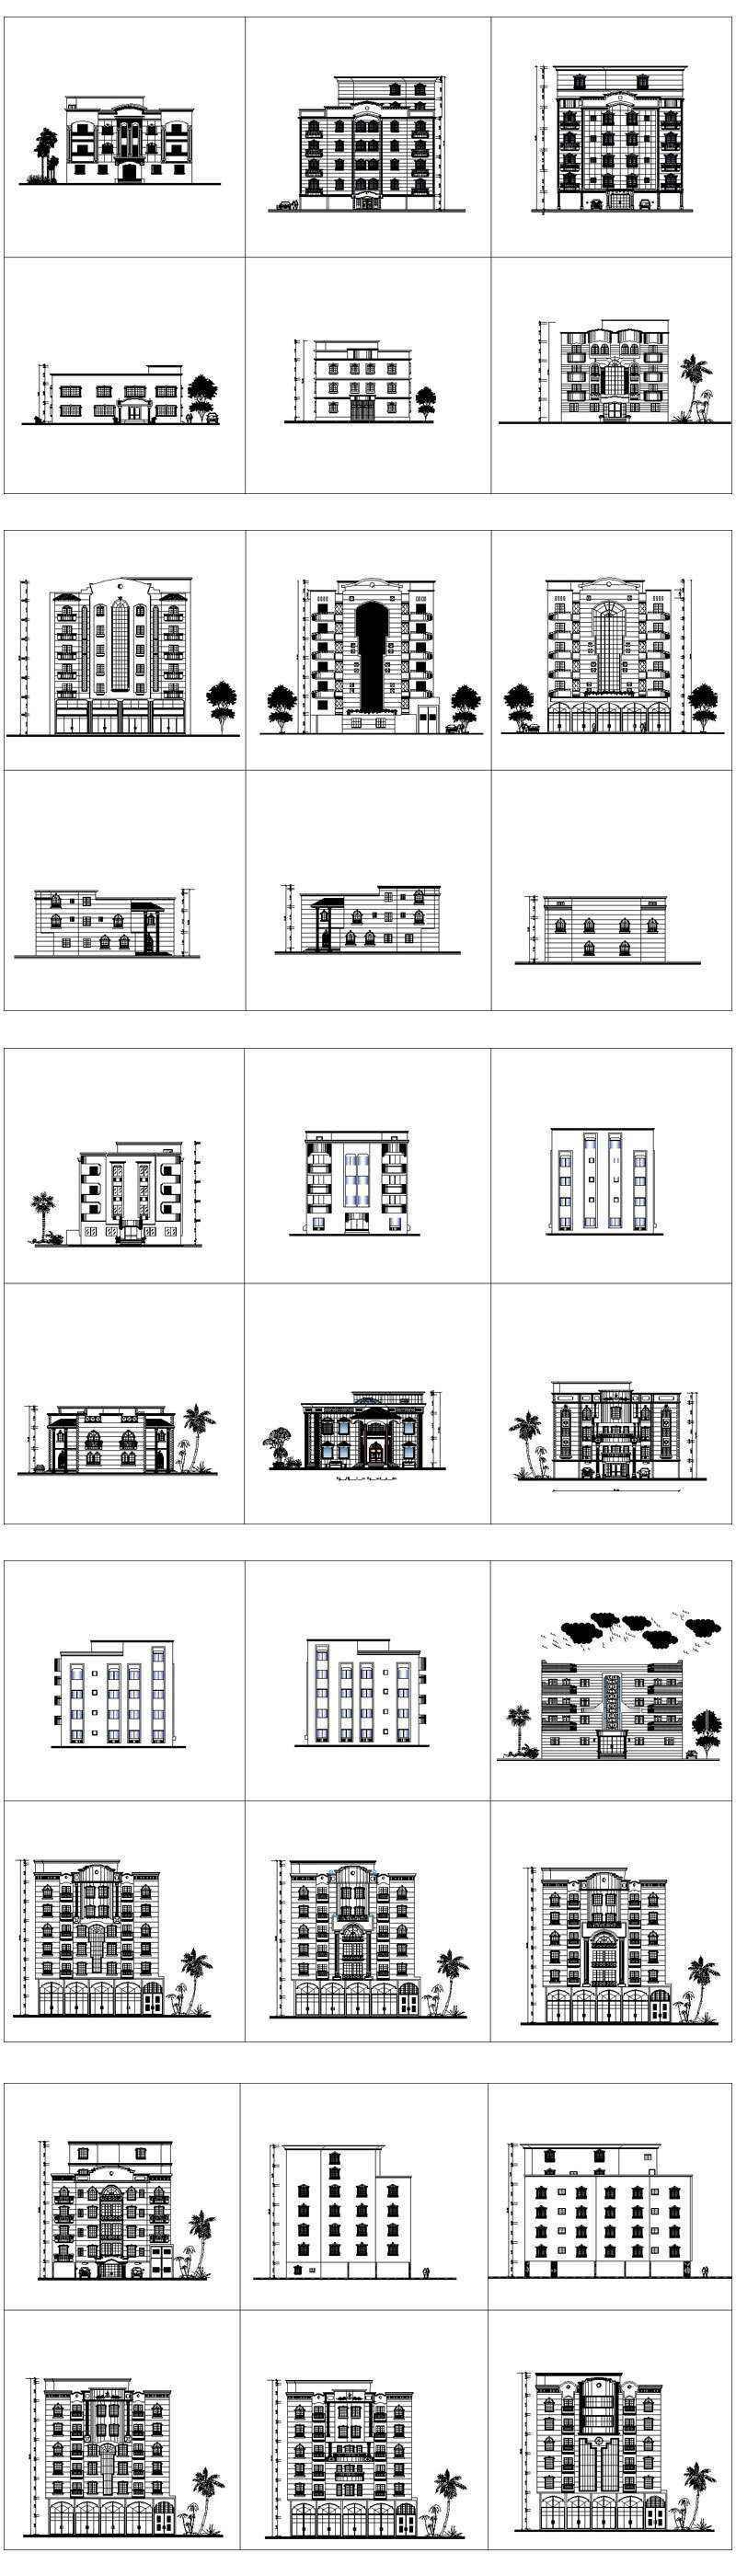 ★【All Gym,Fitness equipment CAD Blocks Bundle-Stadium,Gymnasium, playground, sports hall V.2】@Gem CAD Blocks,Autocad Blocks,Drawings,CAD Details